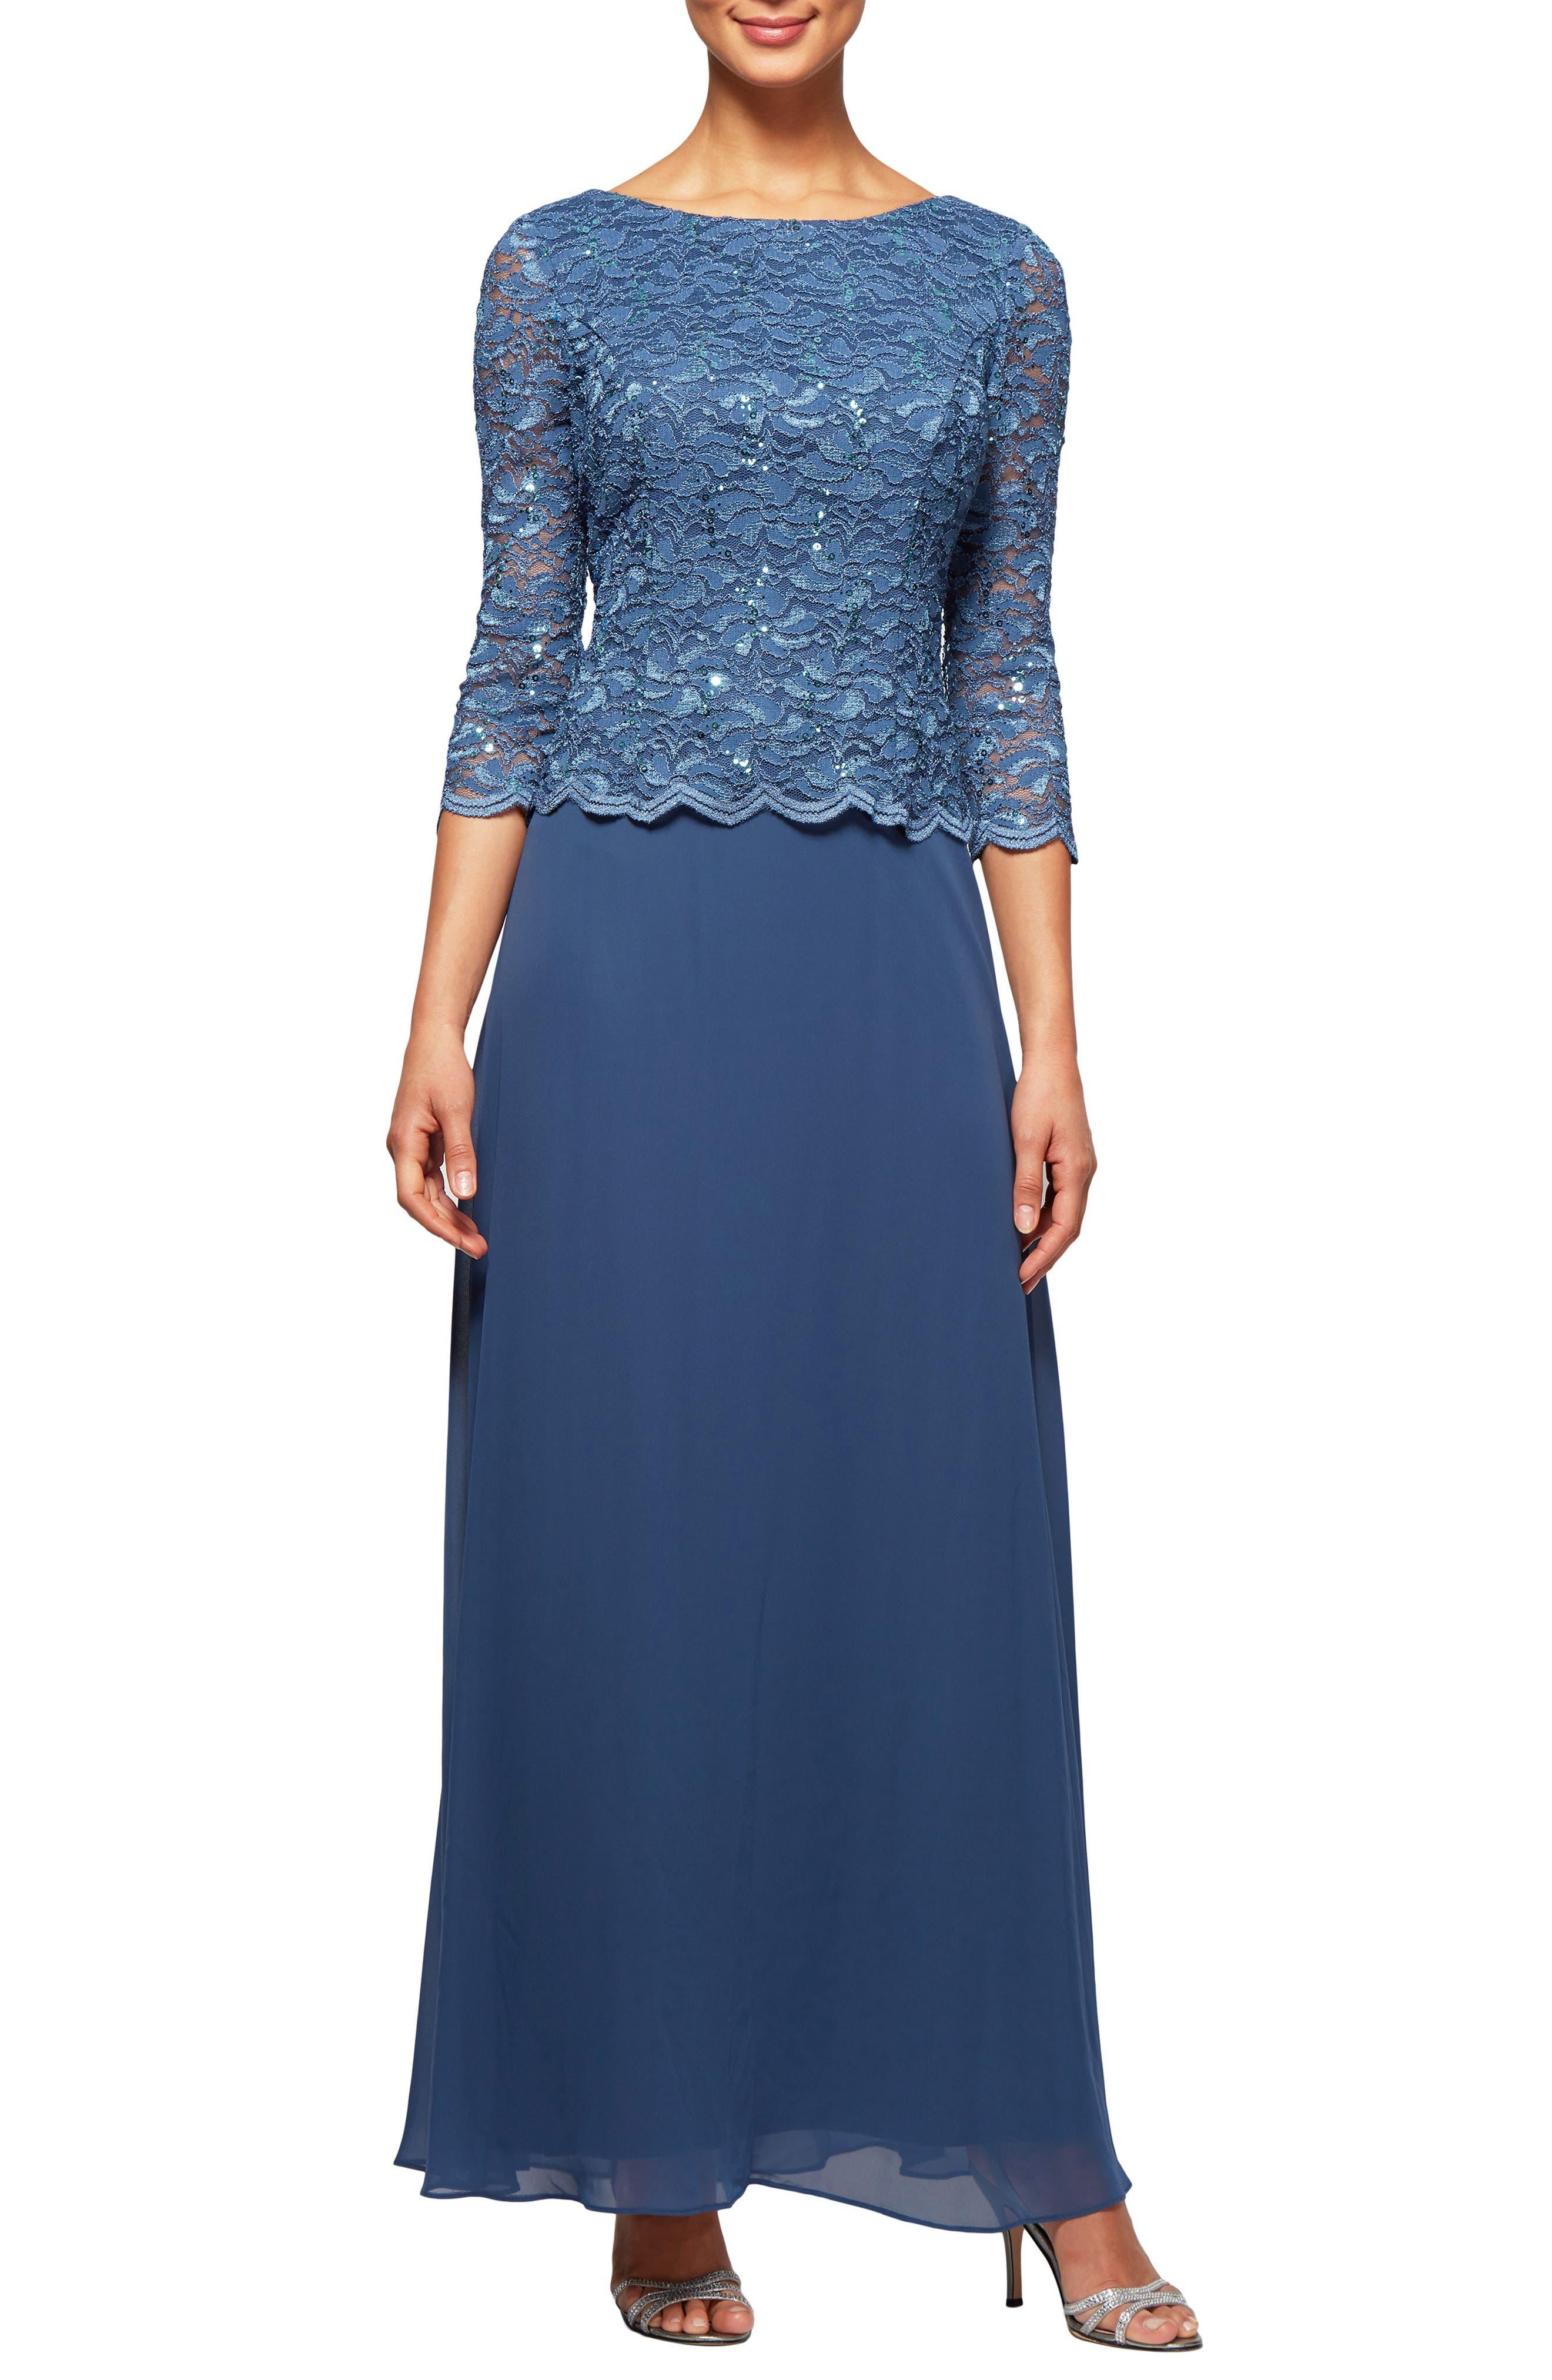 Petite Alex Evenings Mock Two-Piece Dress, Blue